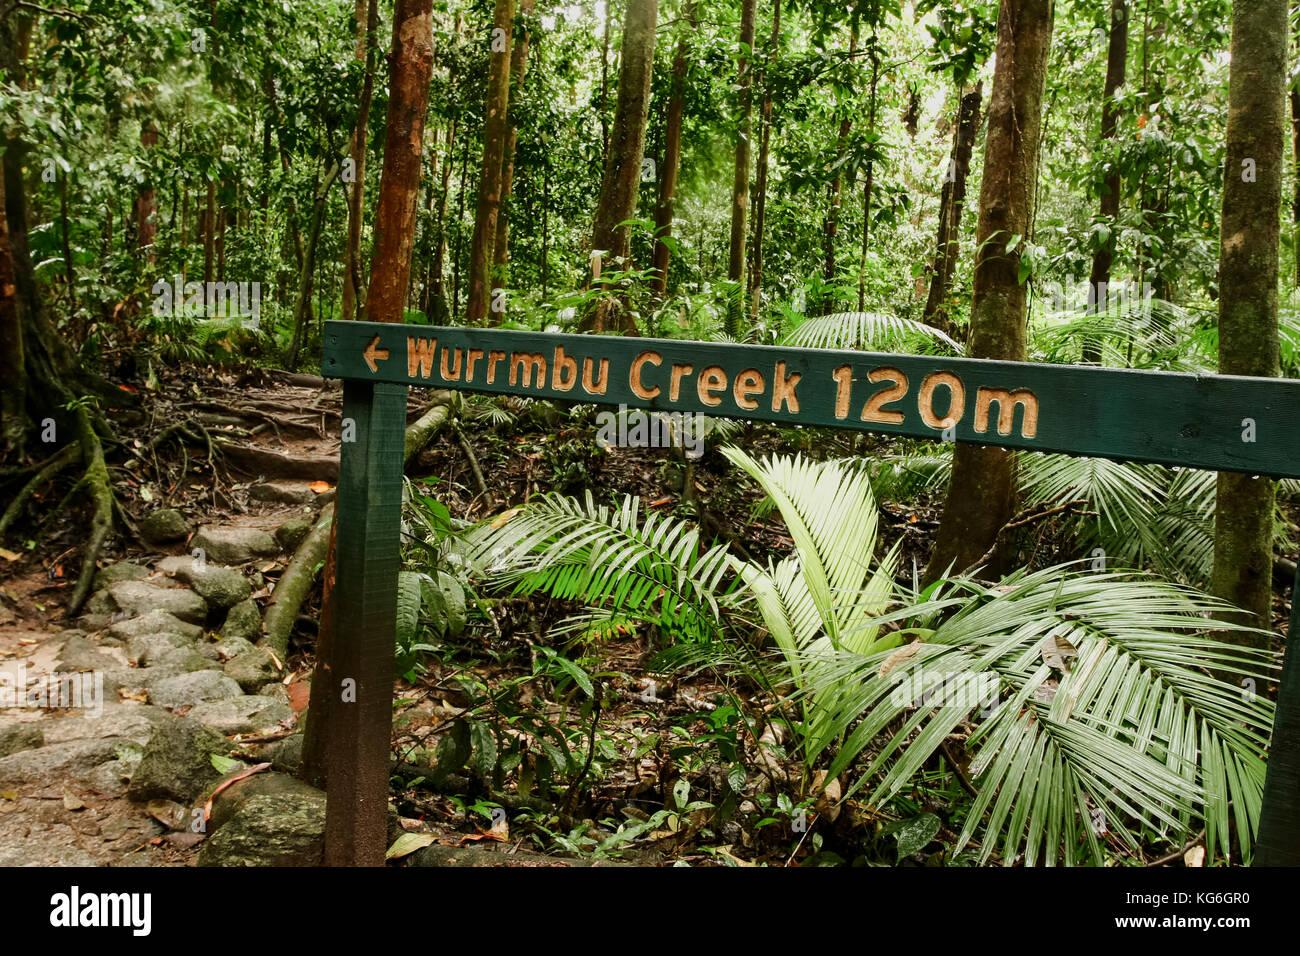 Wurrmbu trail sign Mossman gorge, Australia Stock Photo